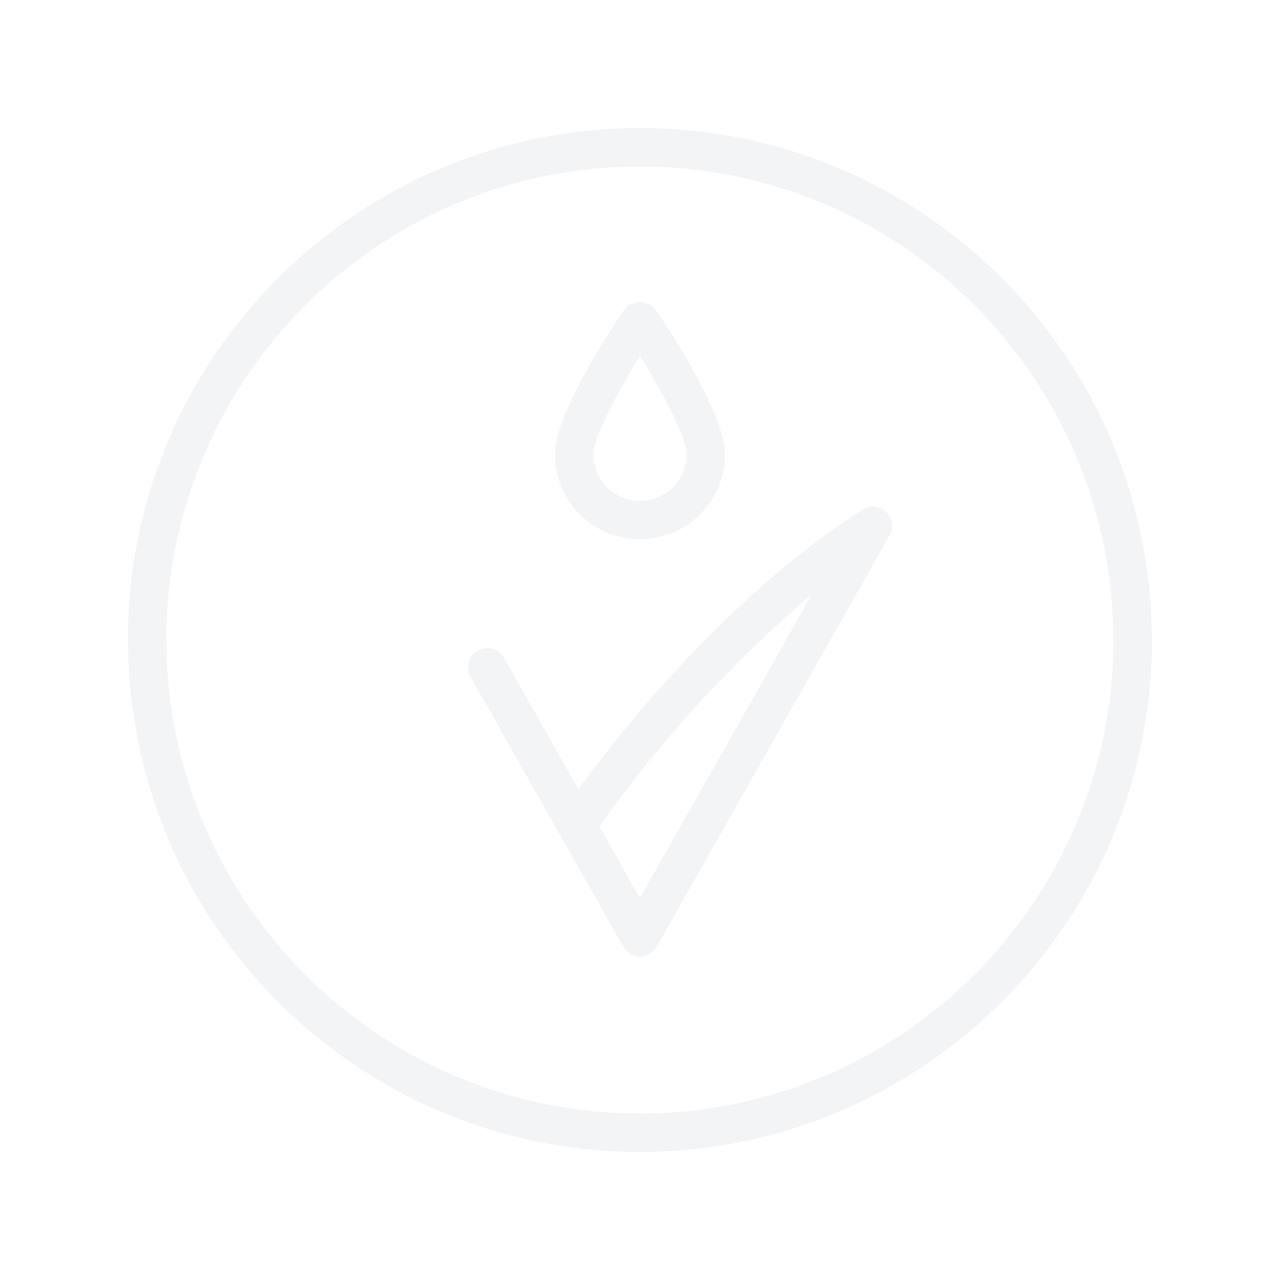 IDUN Minerals Brush Face Definer